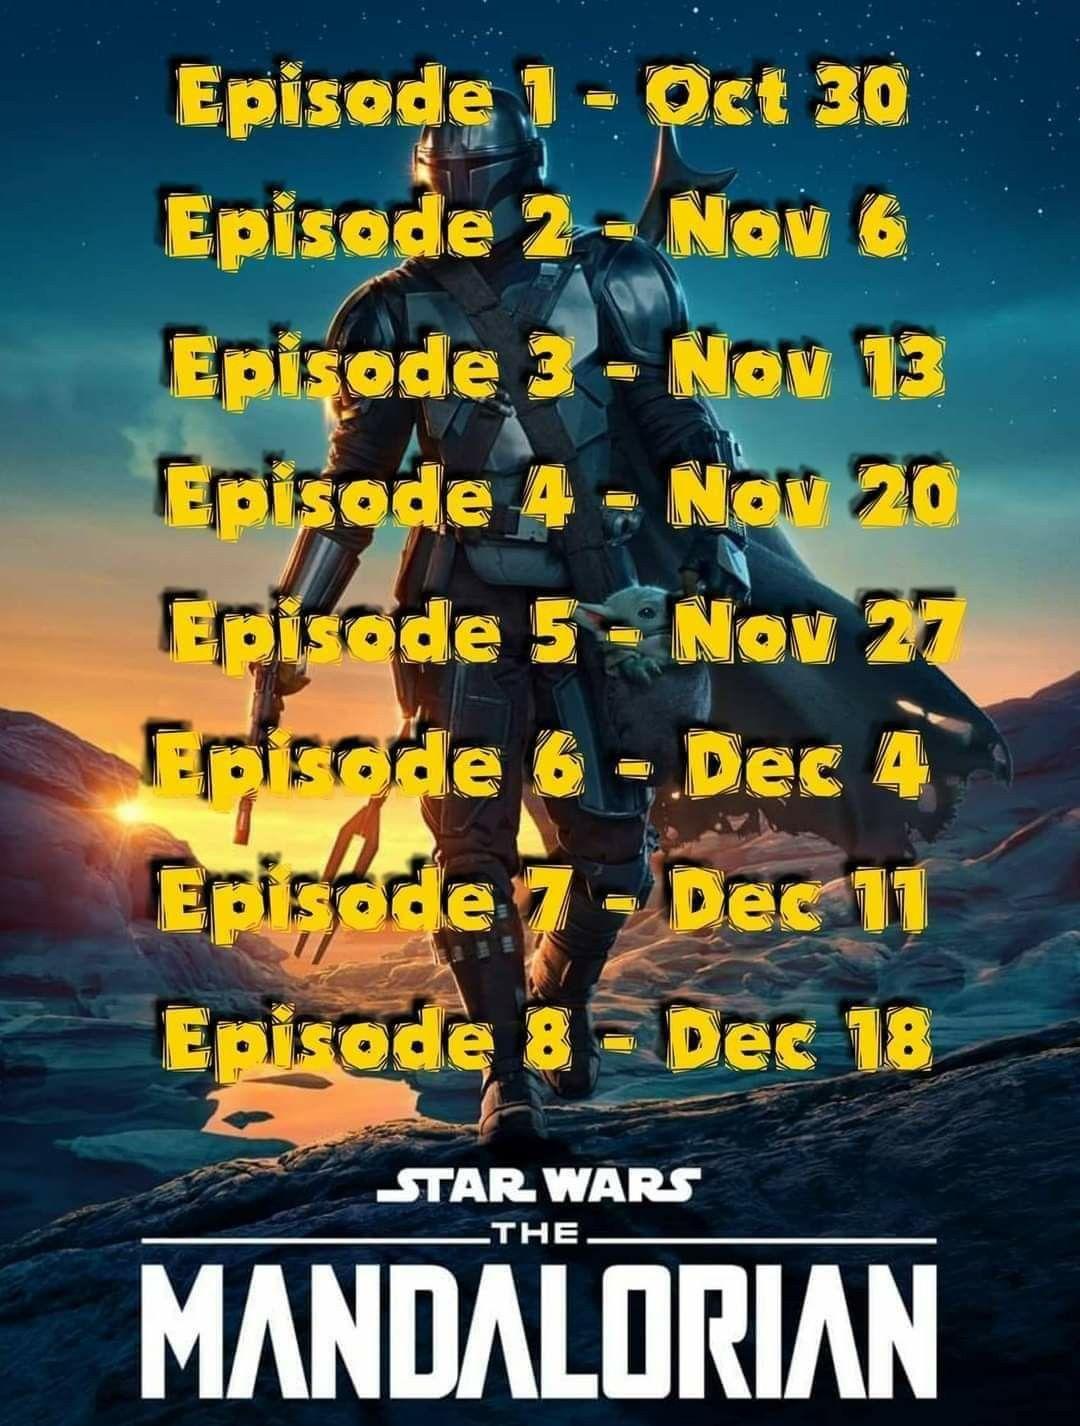 Pin By Jim Keneagy On Star Wars Star Wars Mandalorian Yoda